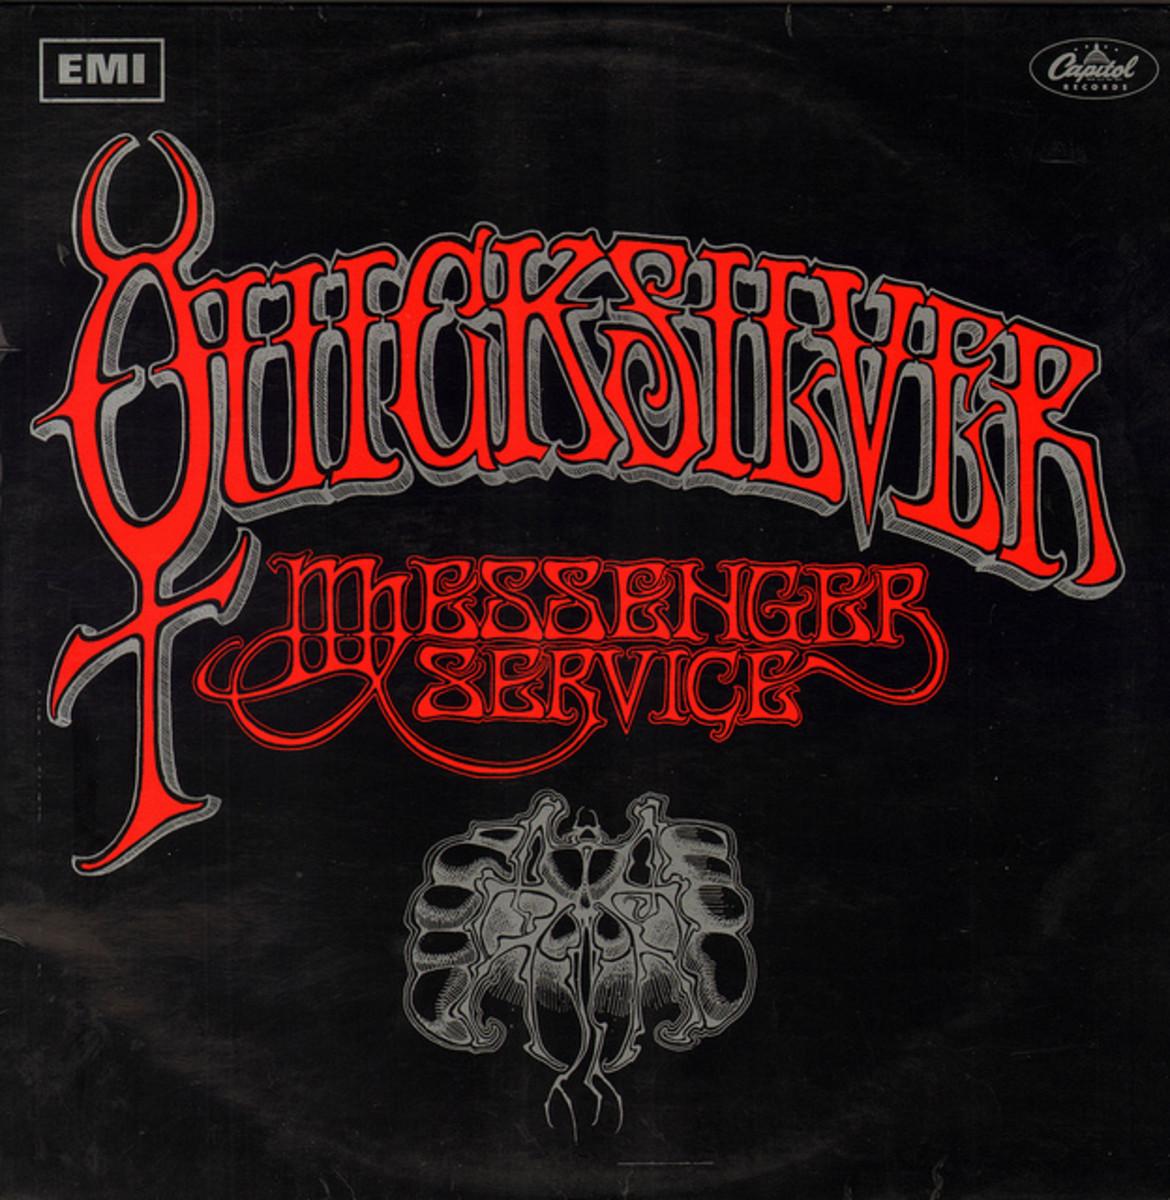 "Quicksilver Messenger Service ""Quicksilver Messenger Service"" EMI / Capitol Records ST 2904 12"" LP Vinyl Record, UKPressing (1968) Album Cover Art by Rick Griffin"